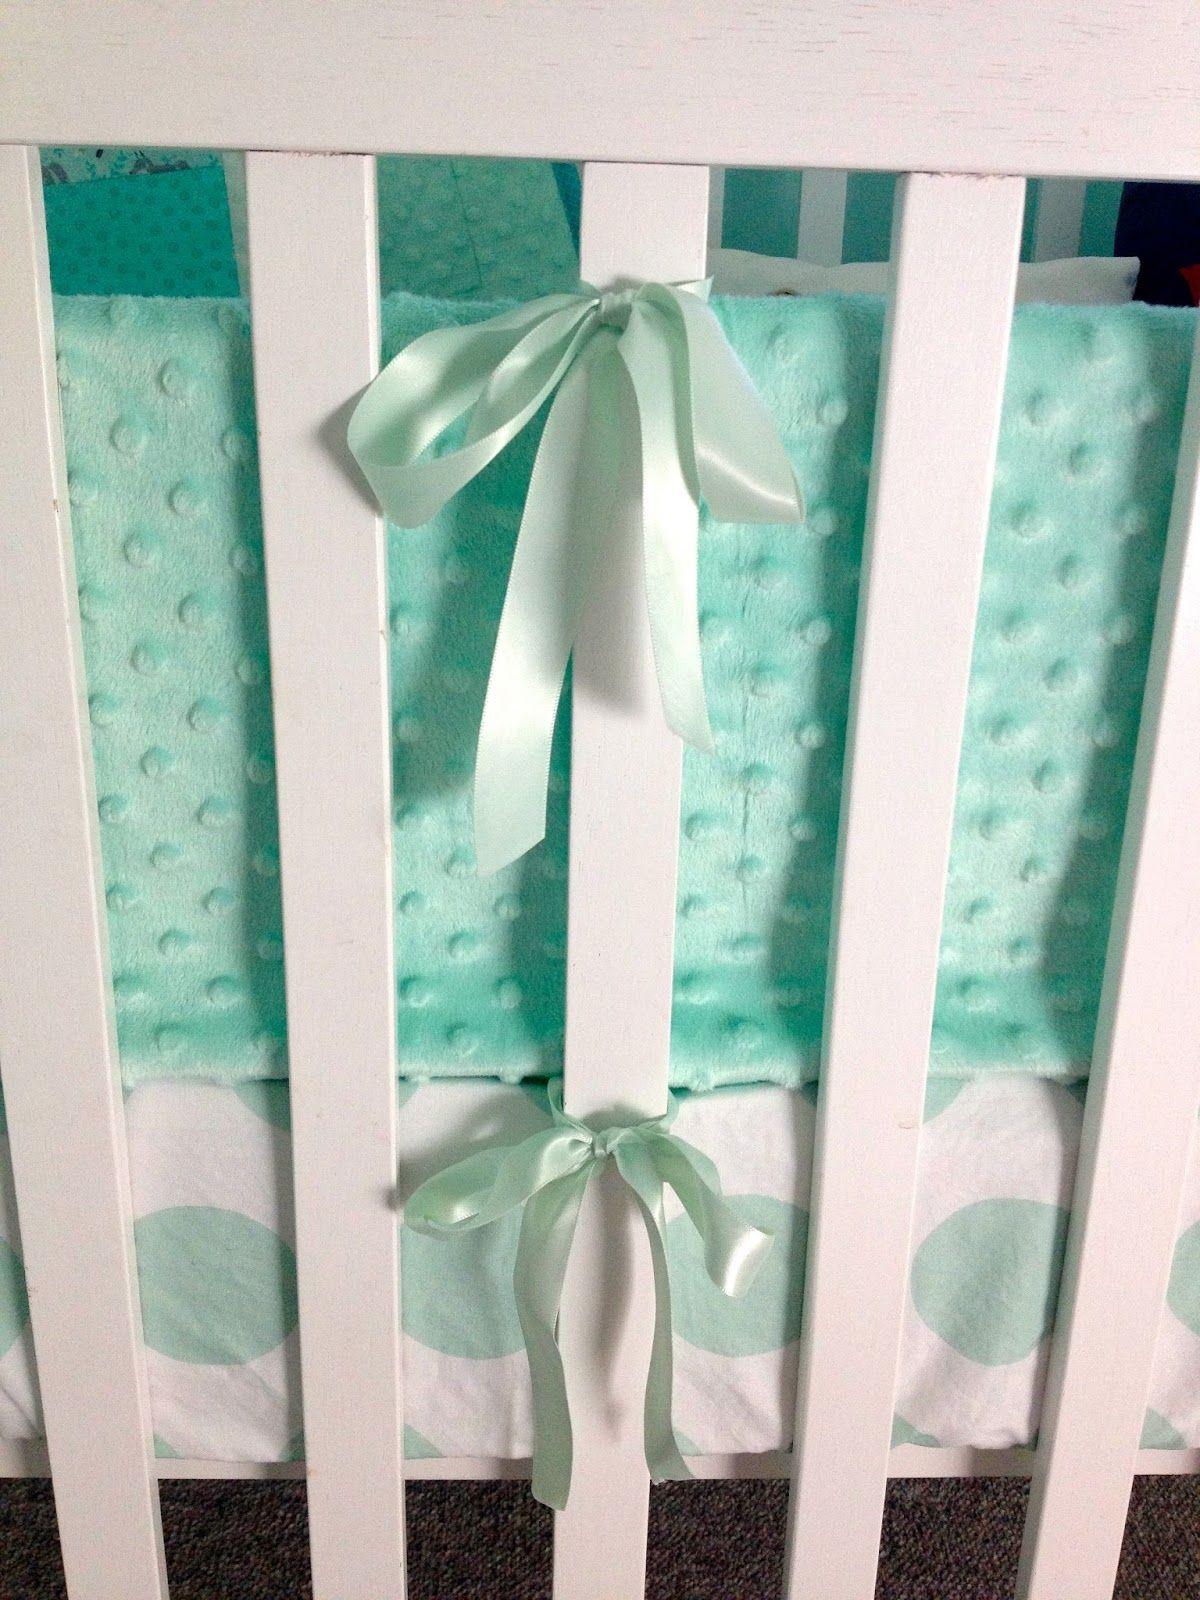 Explore Crib Sheets, Crib Bedding, and more!